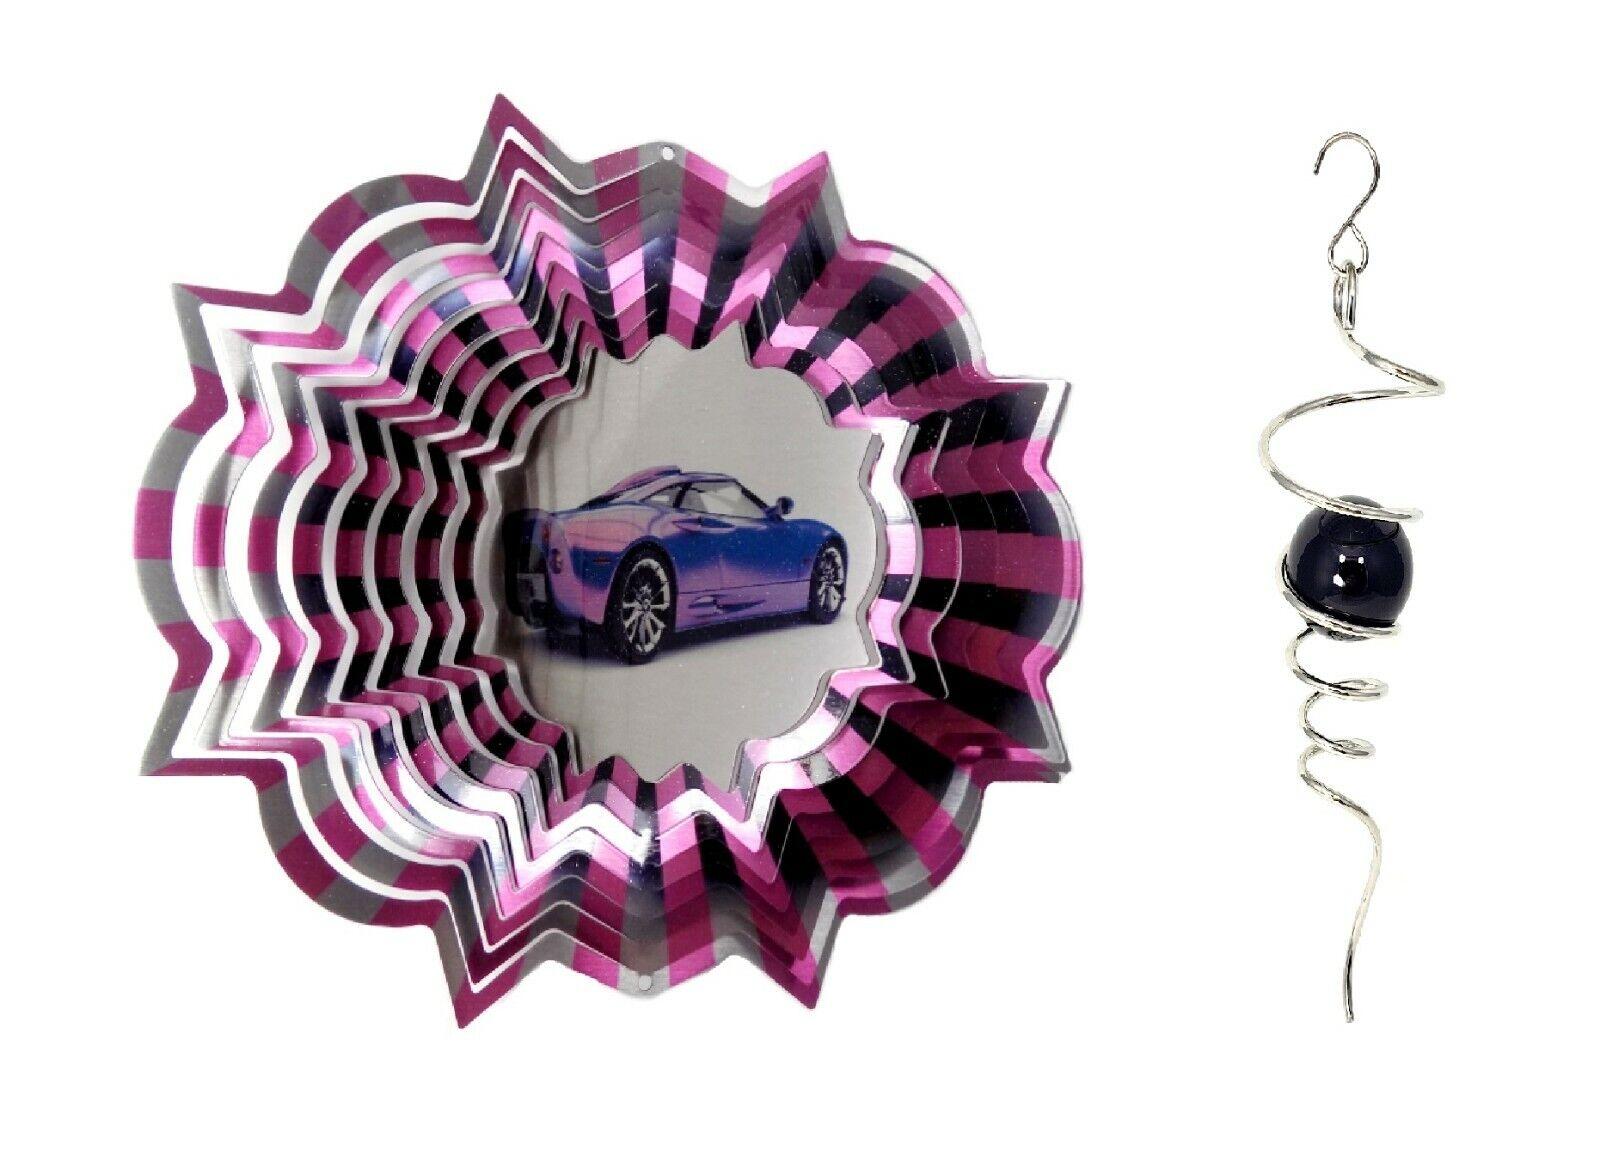 WorldaWhirl 3D Wind Spinner Race Car Sports Car SS Patio Whirligig Yard Twister